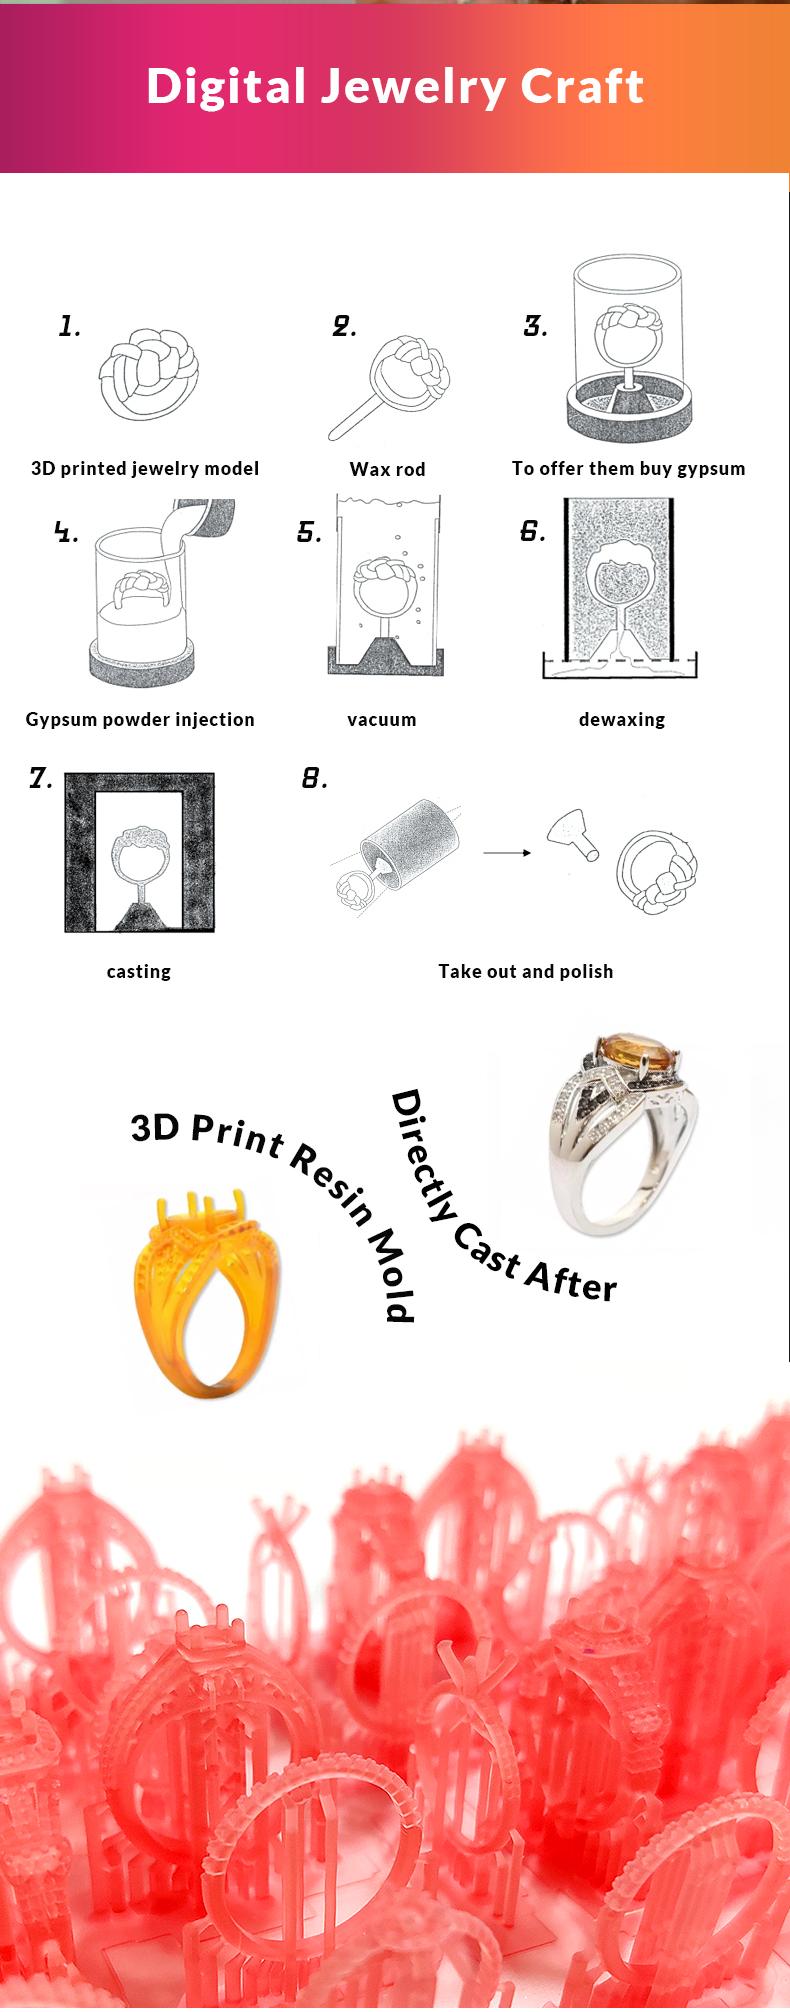 Ifun 品質保証ジュエリー鋳造 100% 残基なしバーンアウト緑色液体プリンタ用樹脂 405nm 液晶 dlp 3D プリンタ